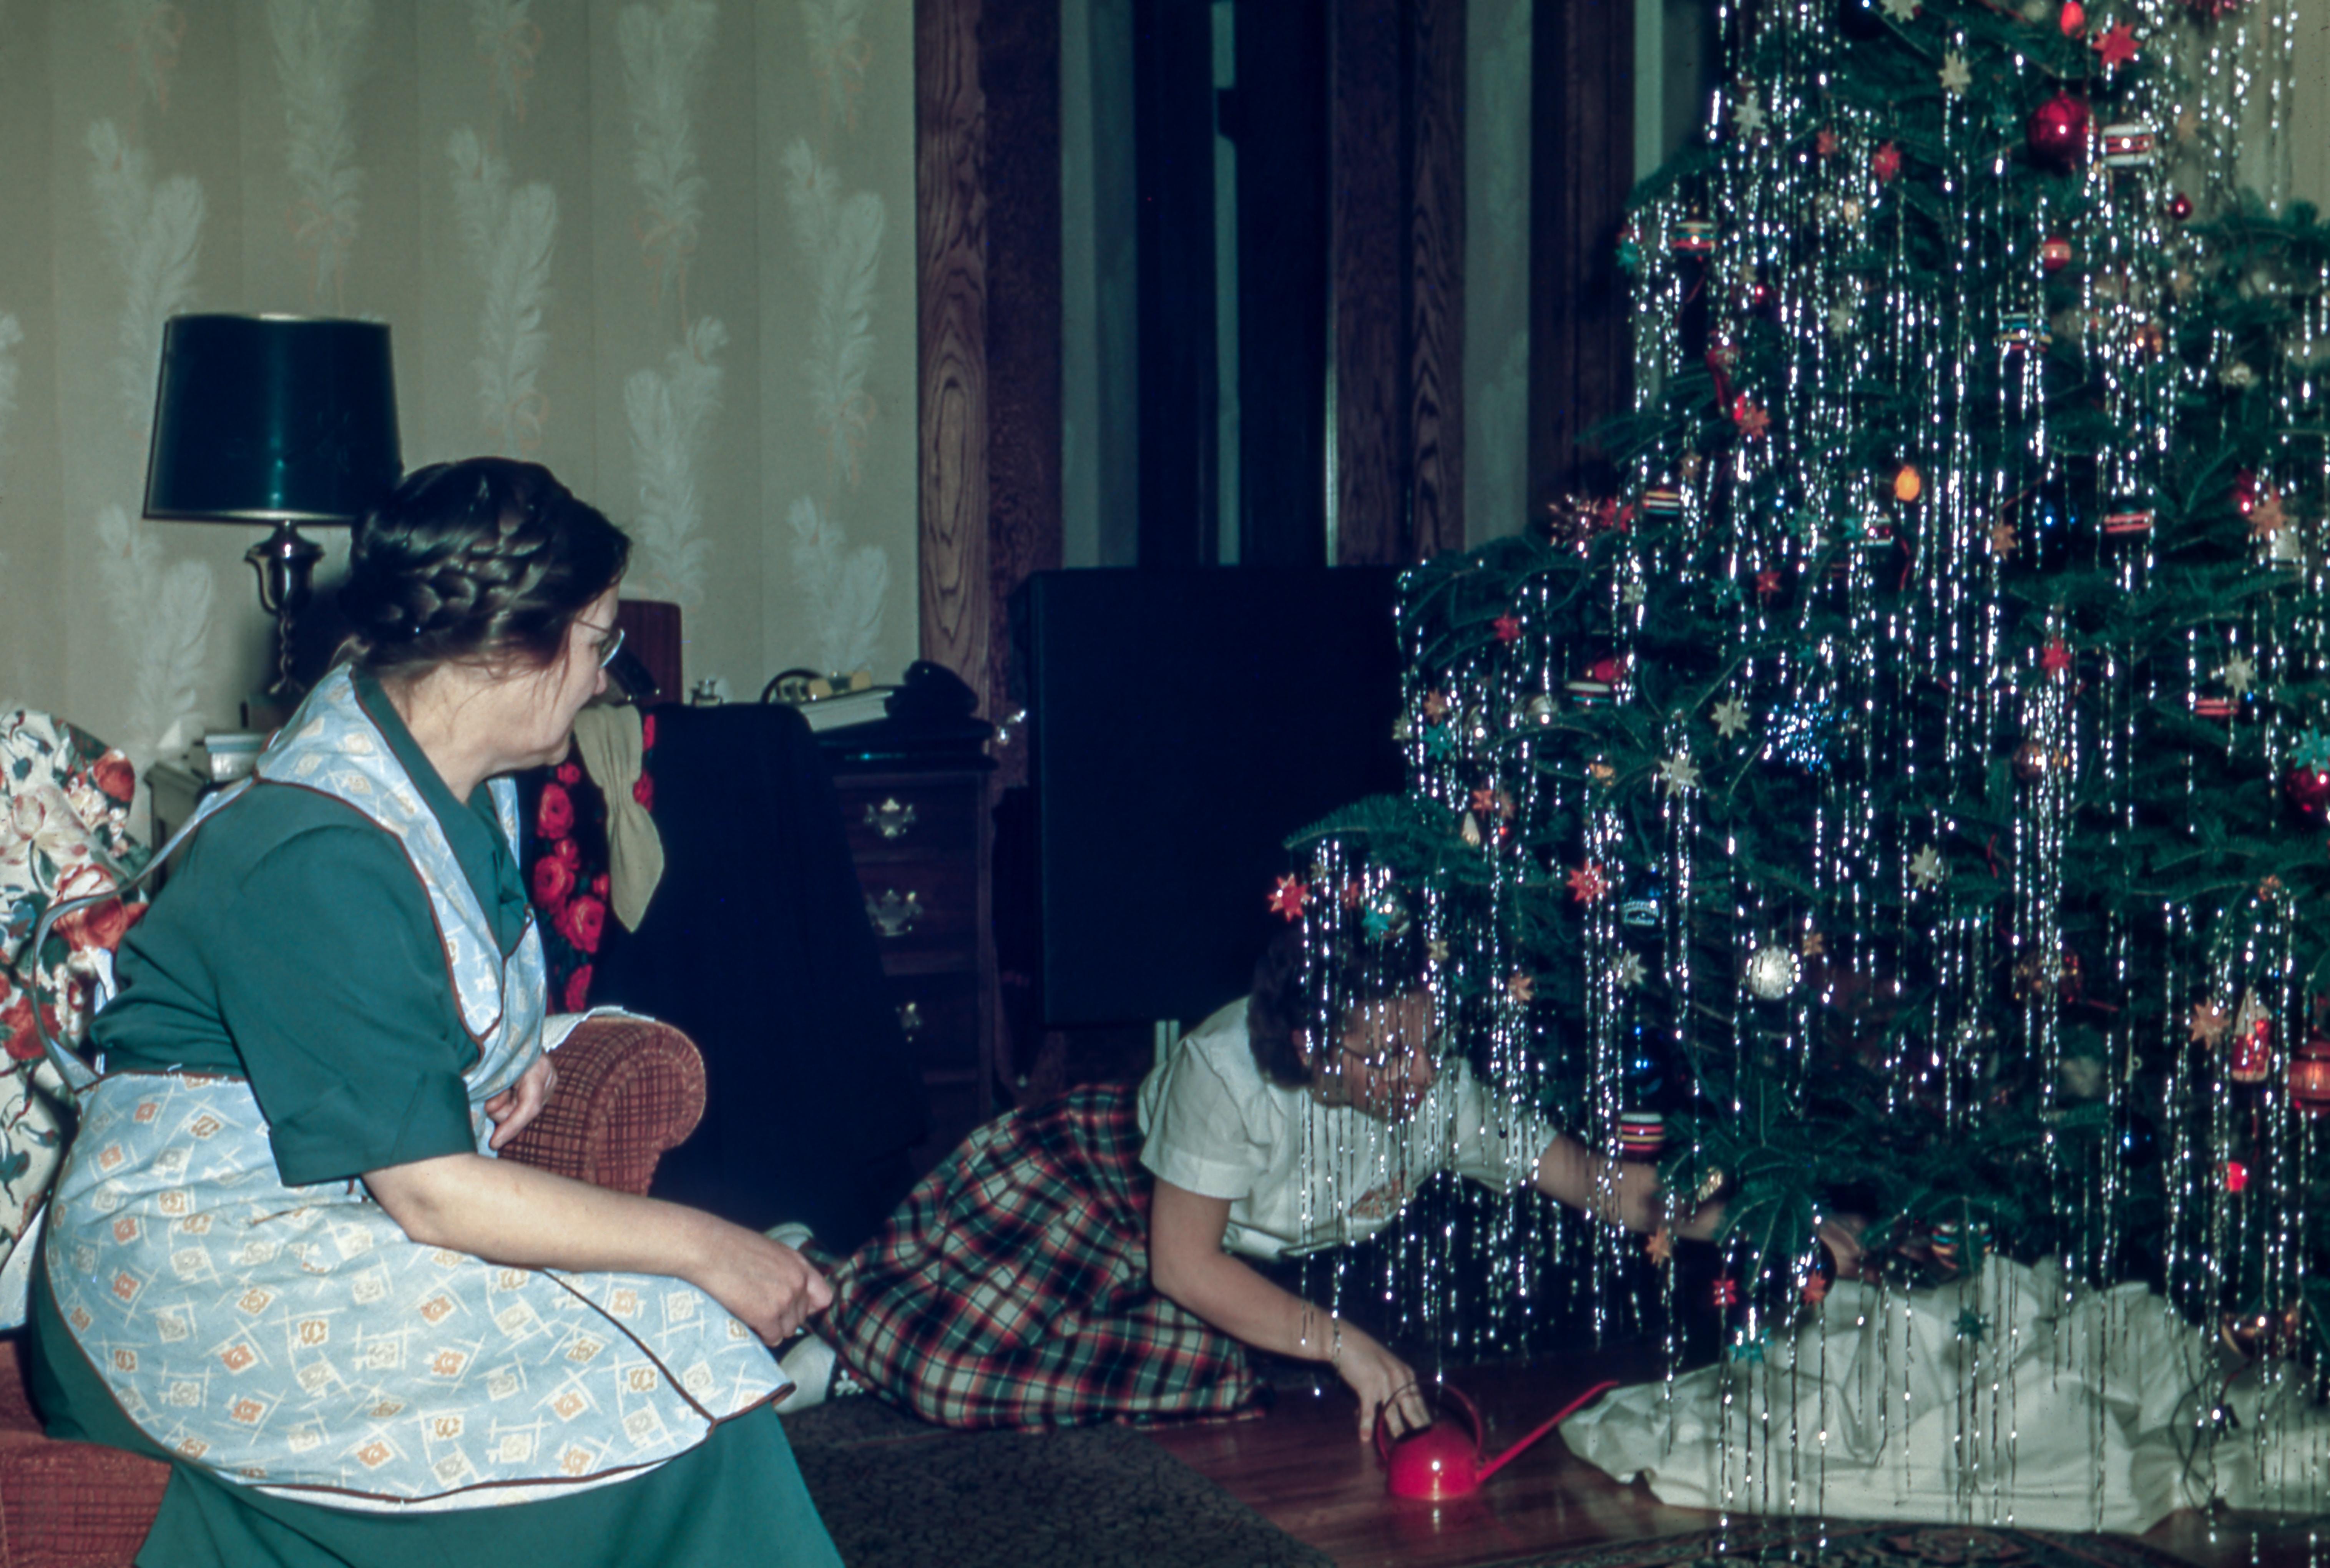 woman sitting under Christmas tree